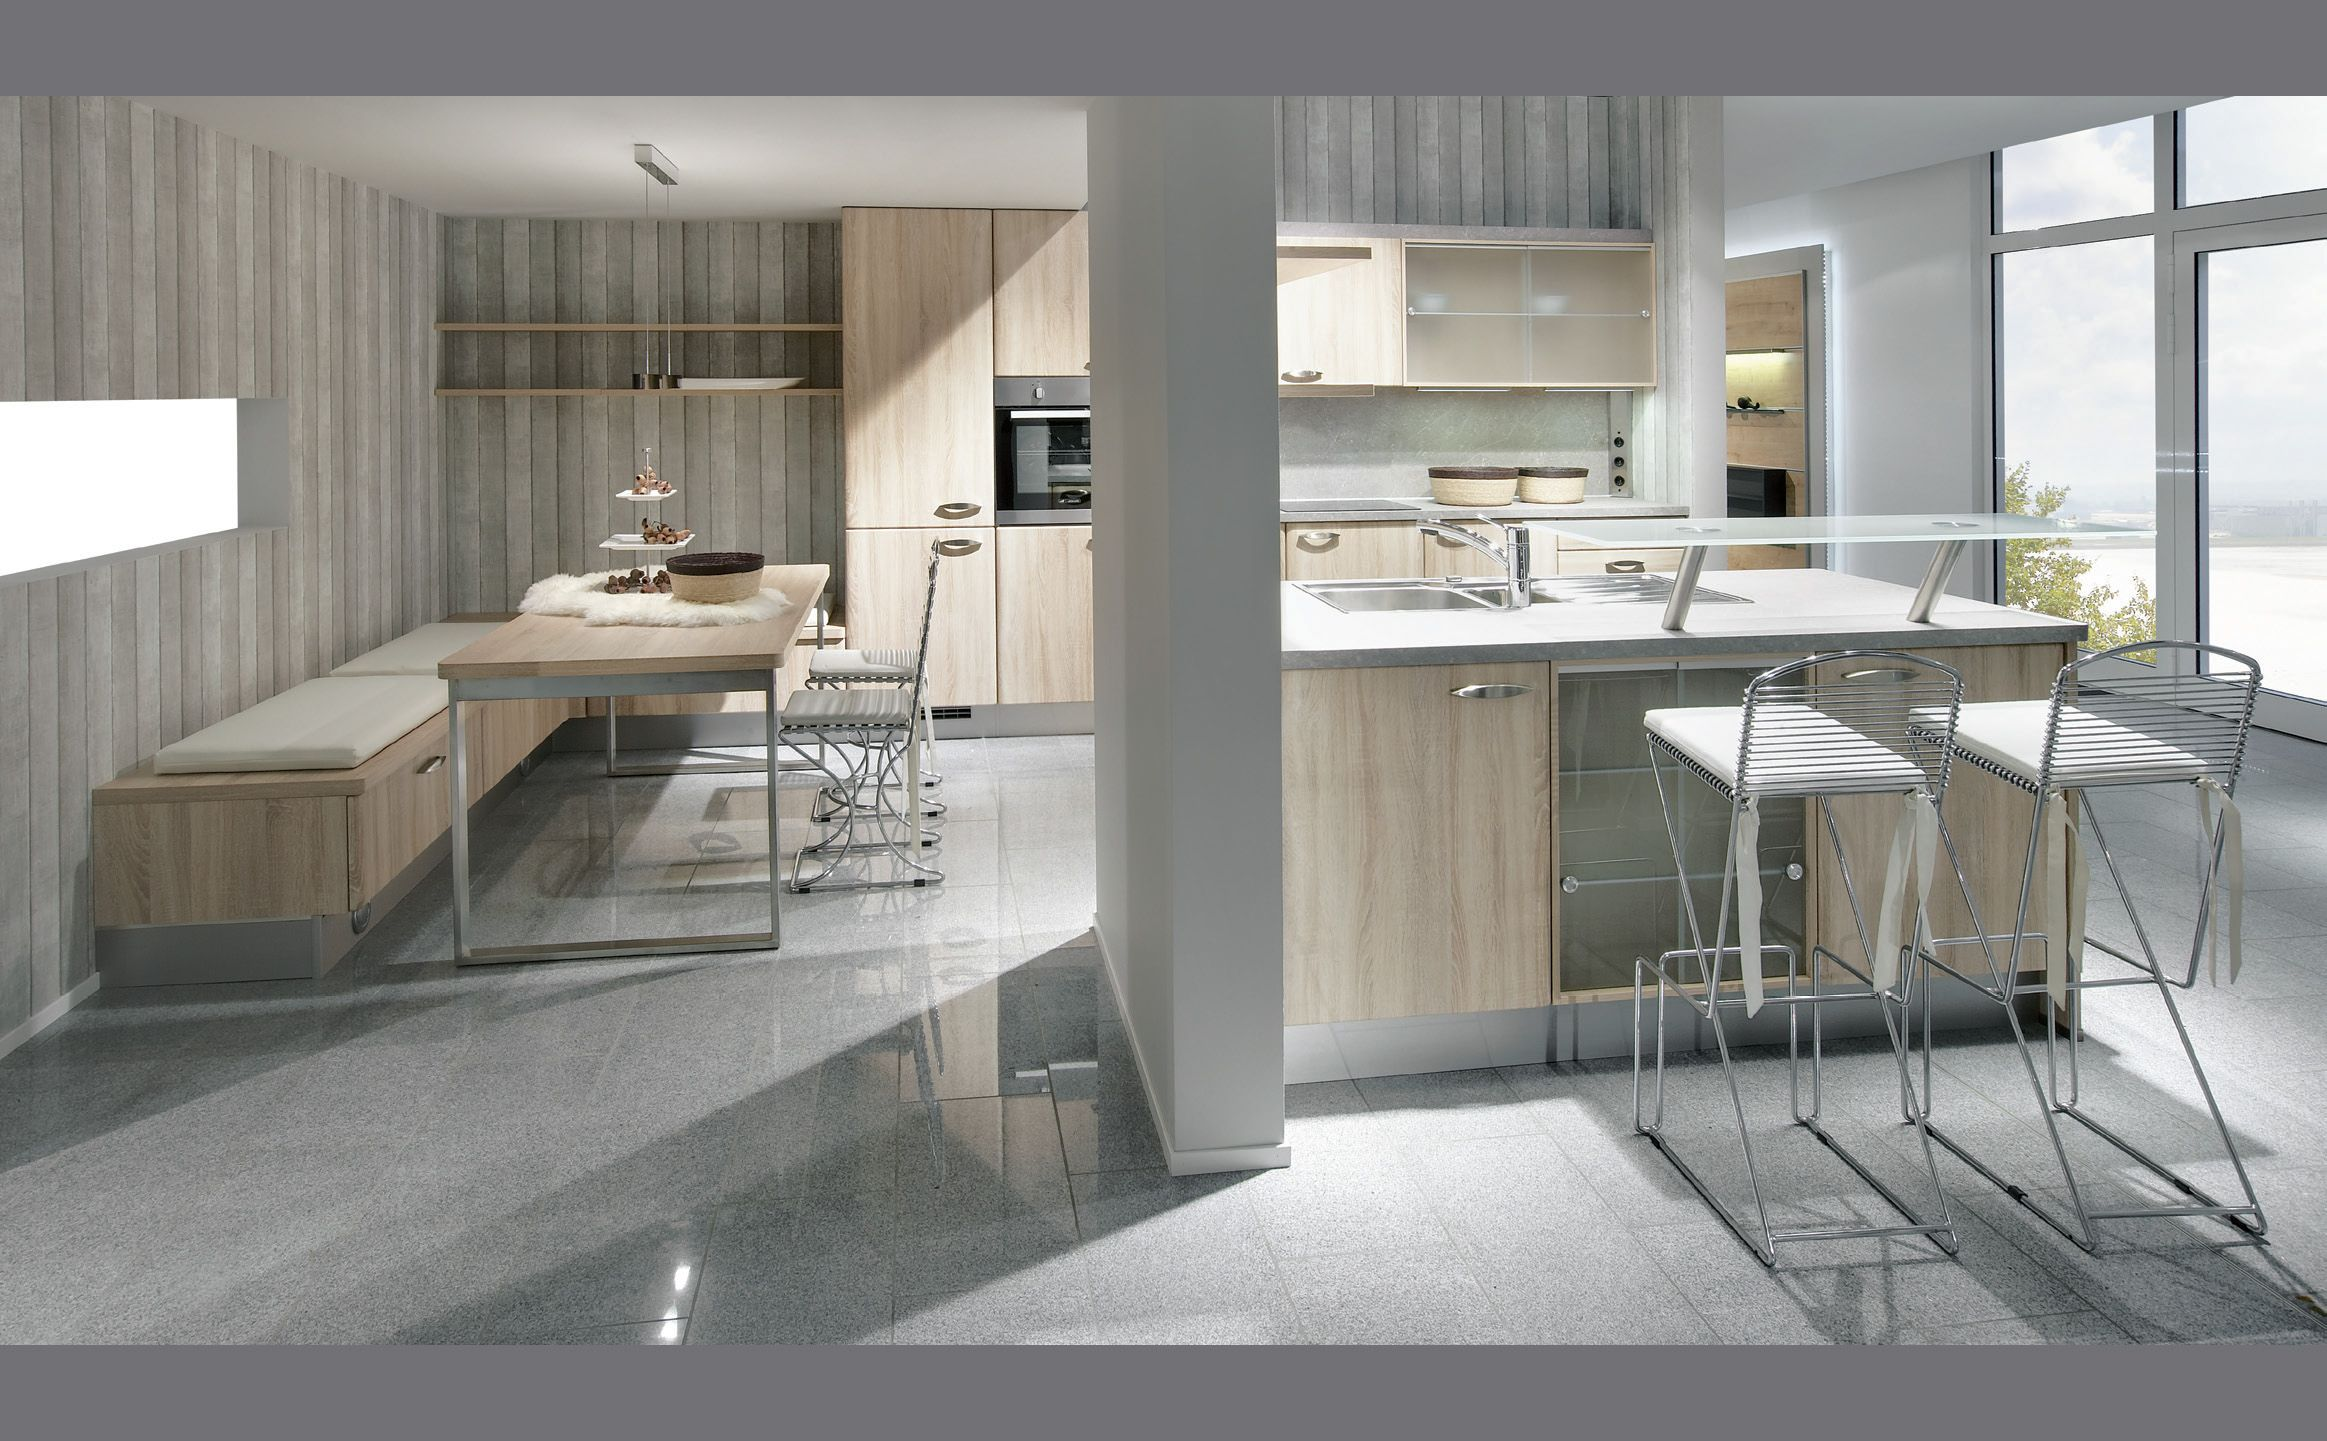 Cocina en madera y gris cocinas kitchens cocinas for Cocina de madera gris oscuro